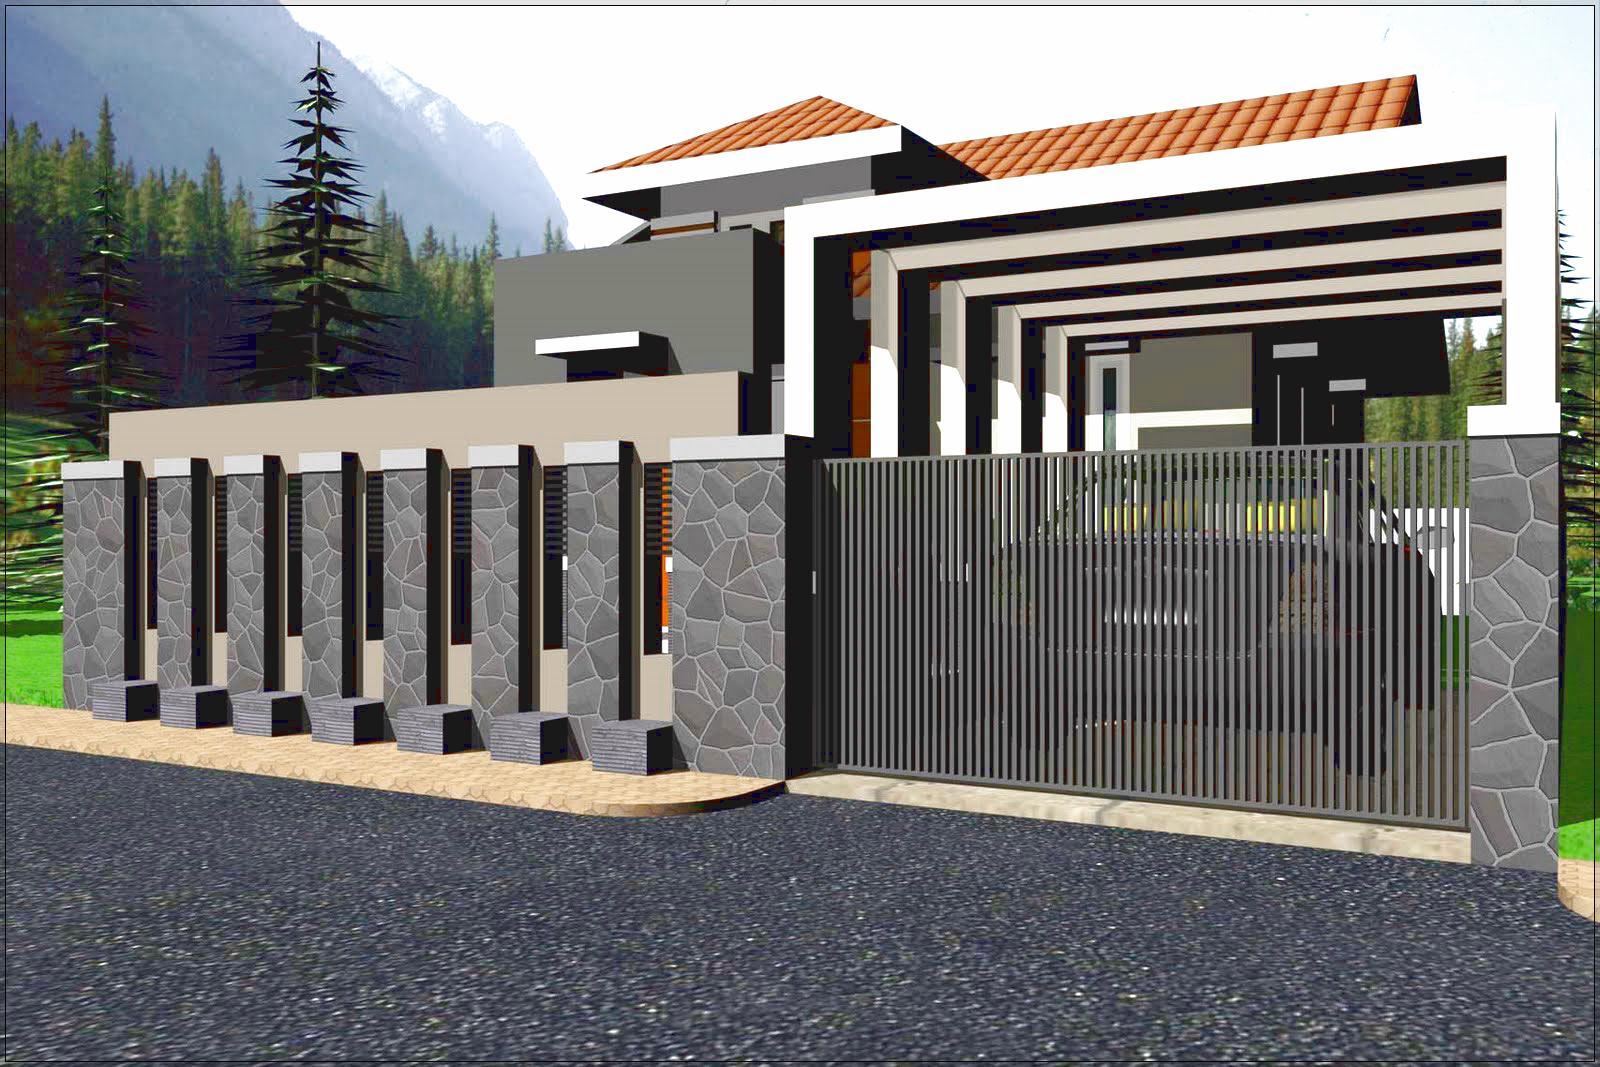 Desain Pagar Rumah Minimalis Modern 1 Lantai Sesuai Budget